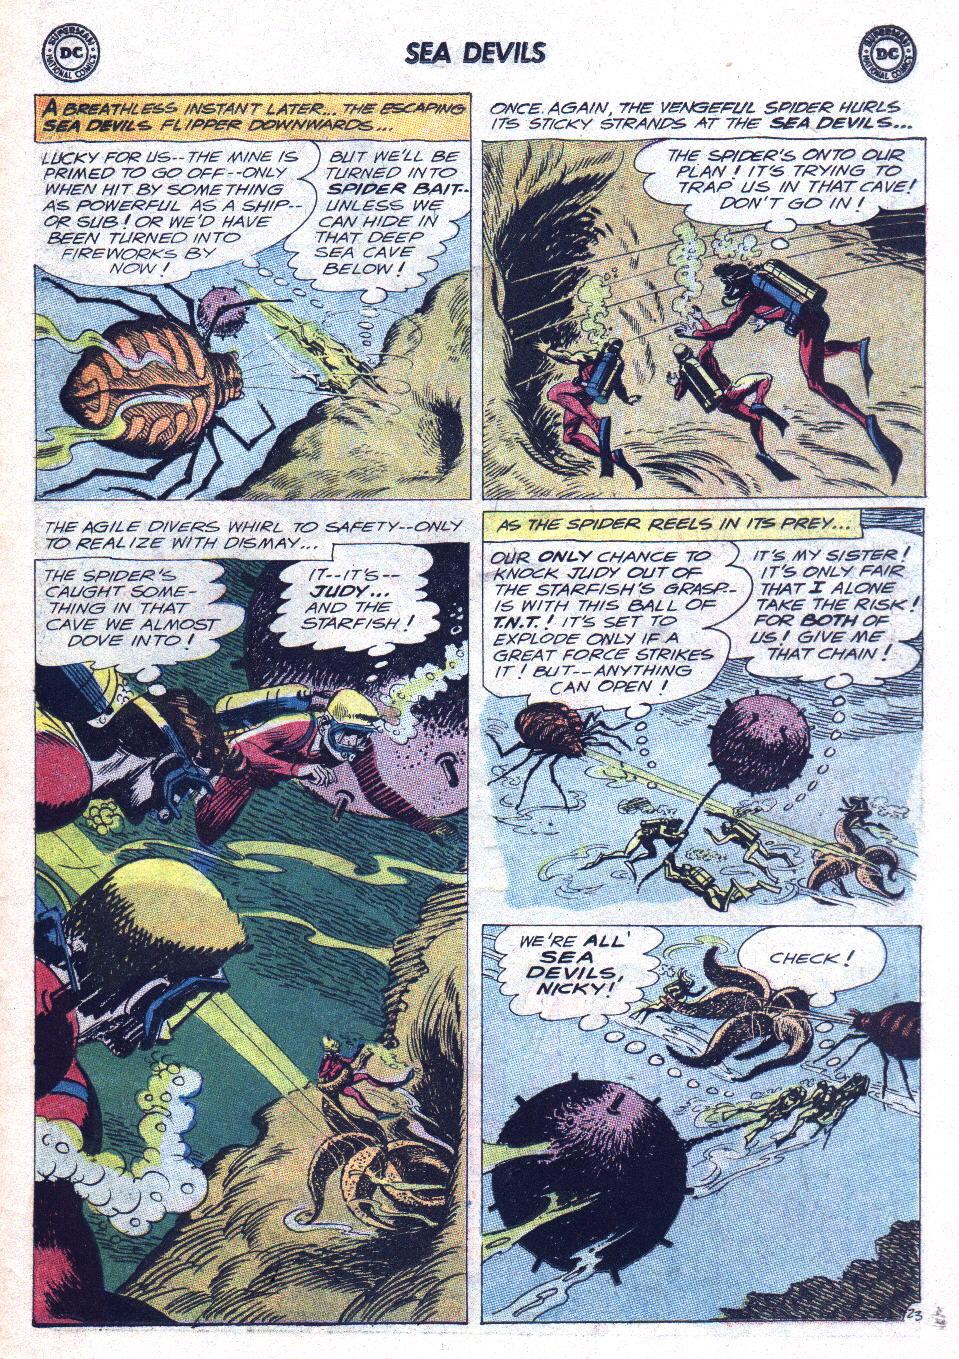 Read online Sea Devils comic -  Issue #15 - 30